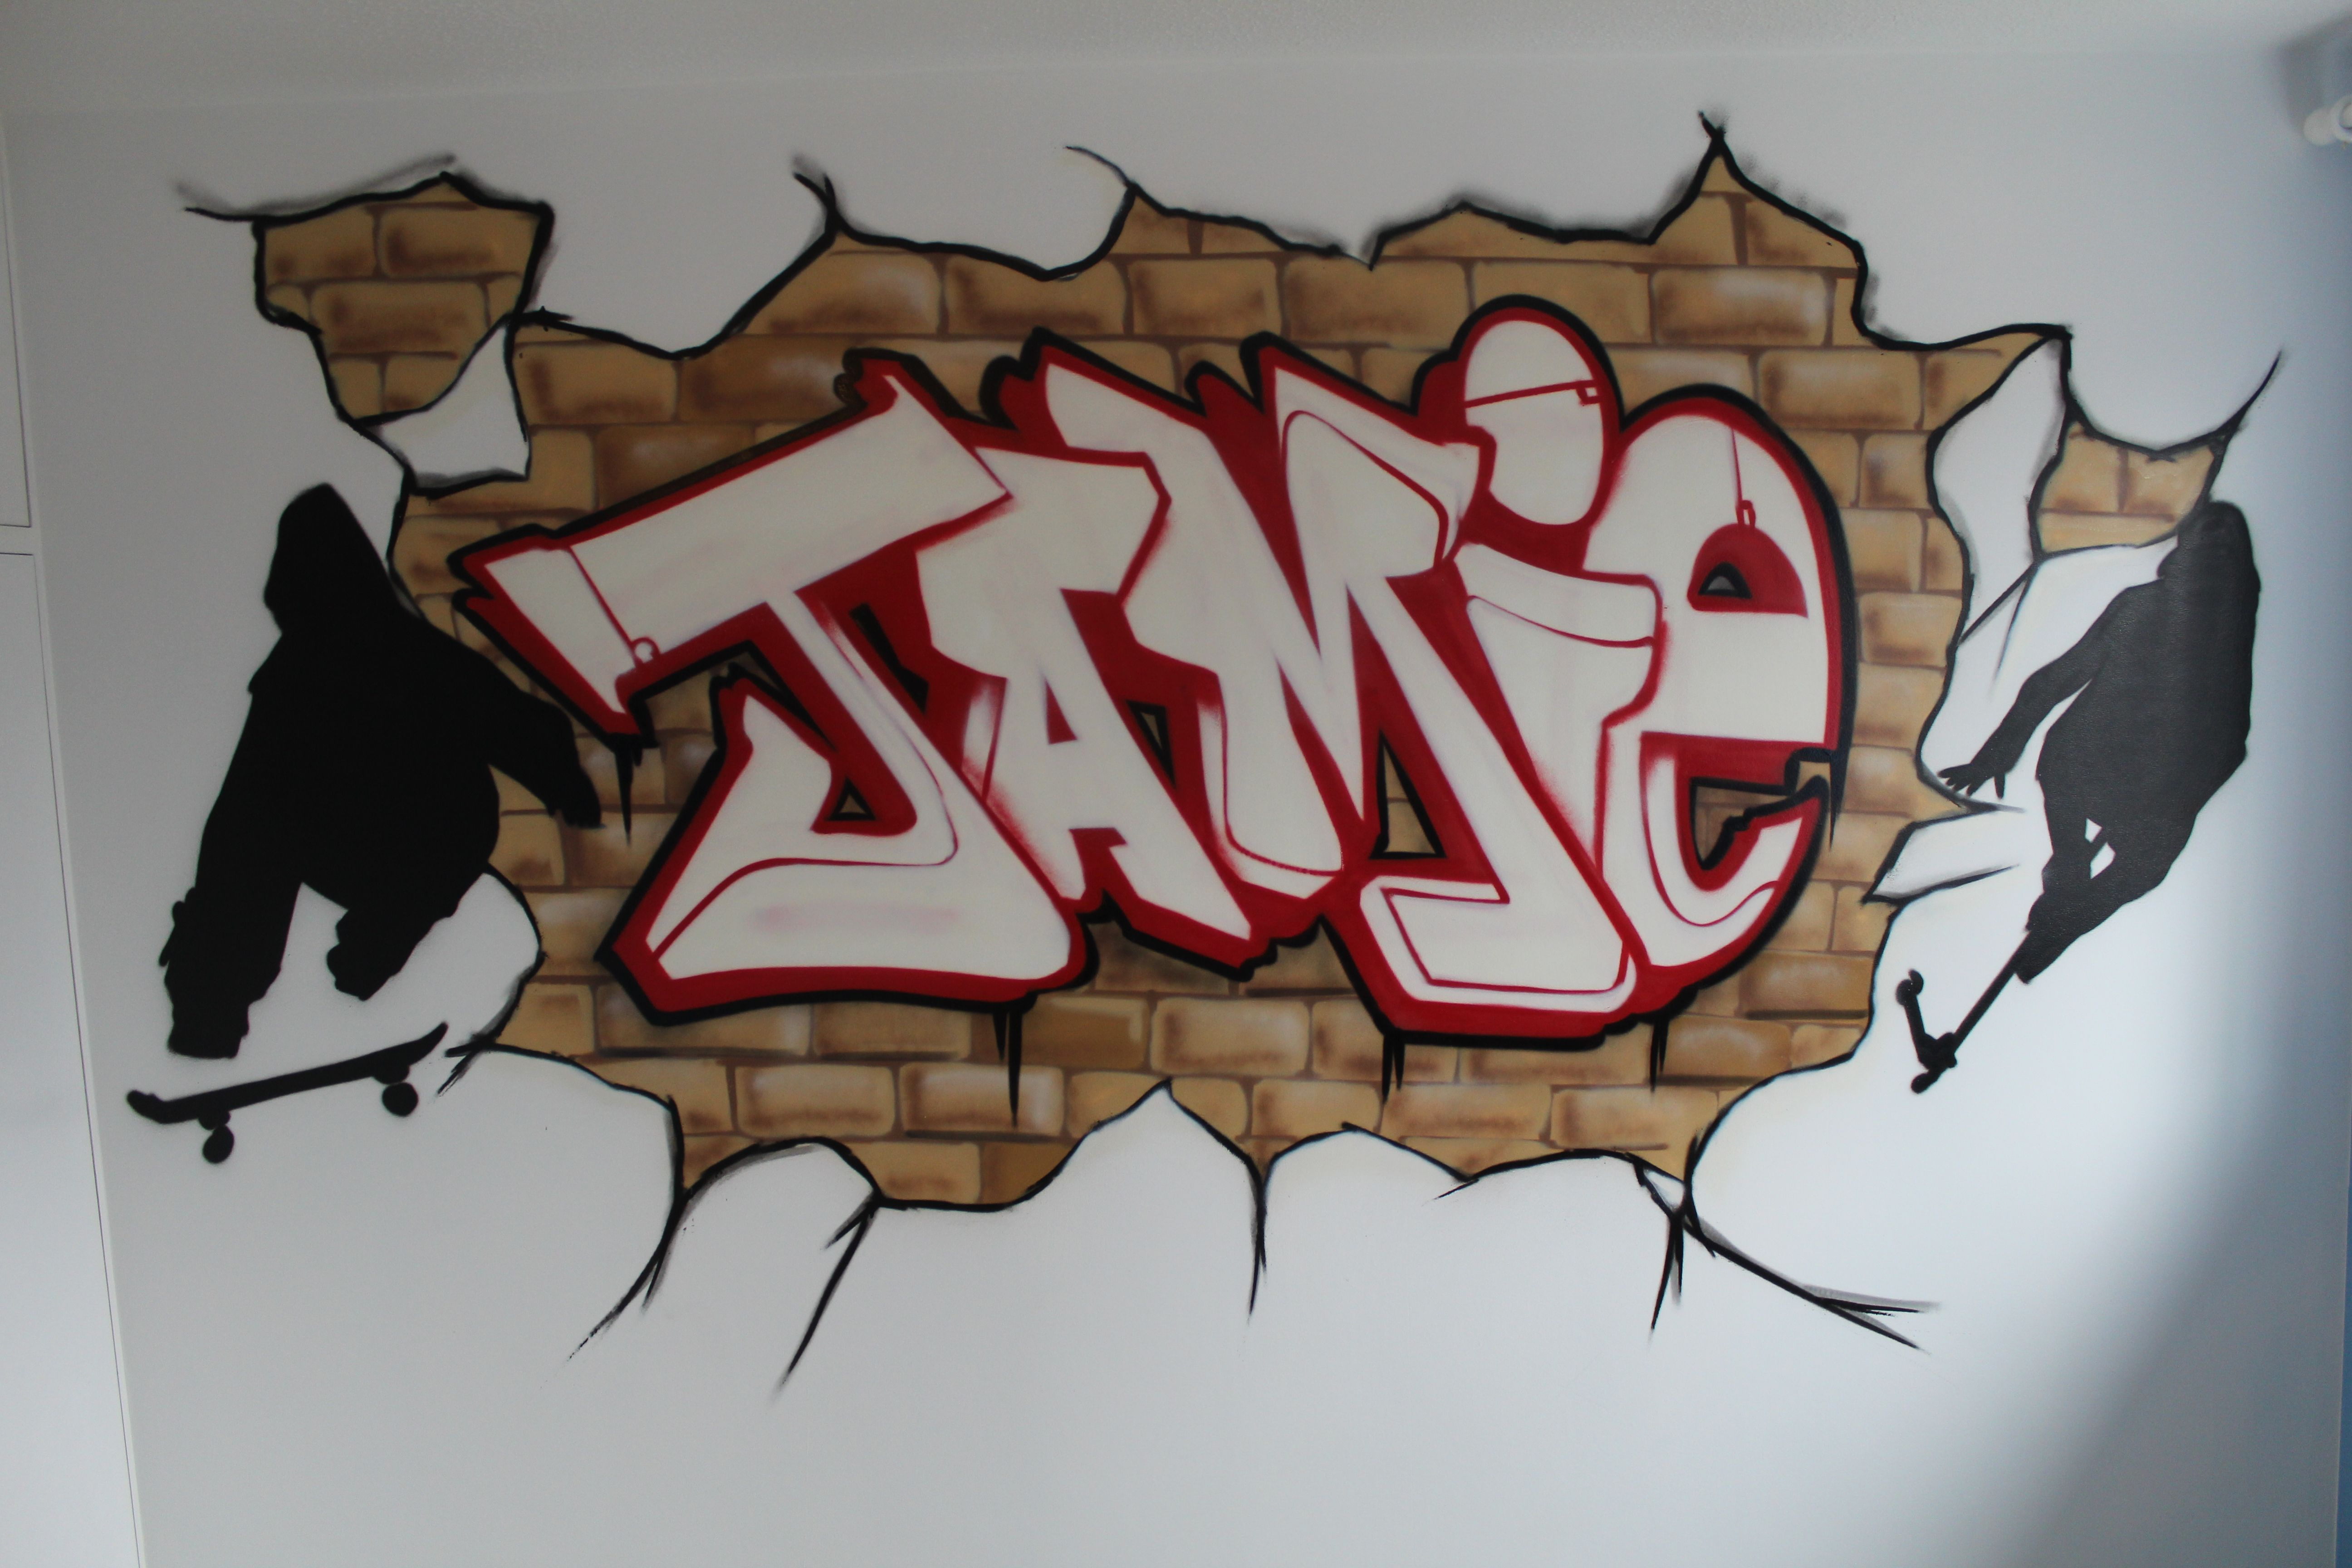 Graffiti murals for bedrooms brick wall graffiti bedrooms graffiti letters styles graffiti names